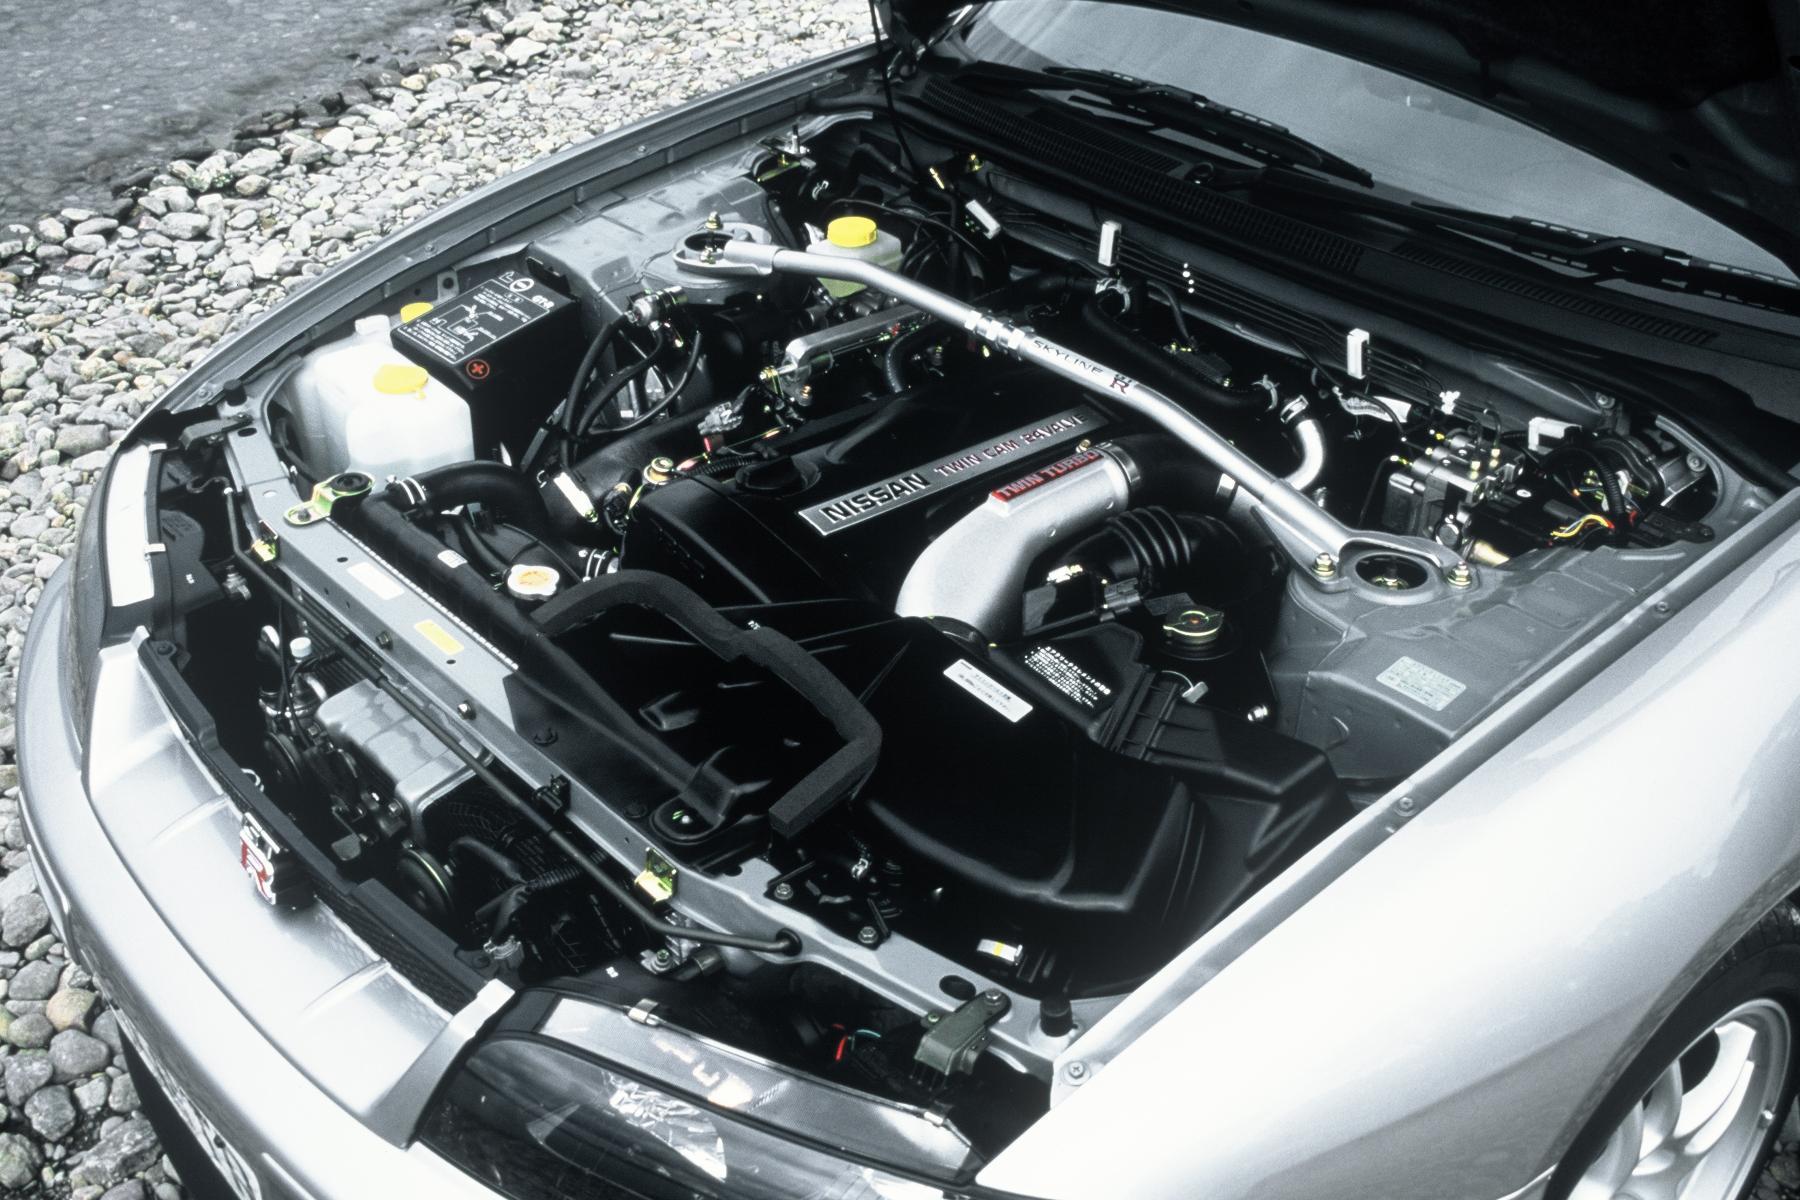 Nissan-GT-R-R33-engine Astounding Vauxhall Lotus Carlton 3.6 Twin Turbo for Sale Cars Trend